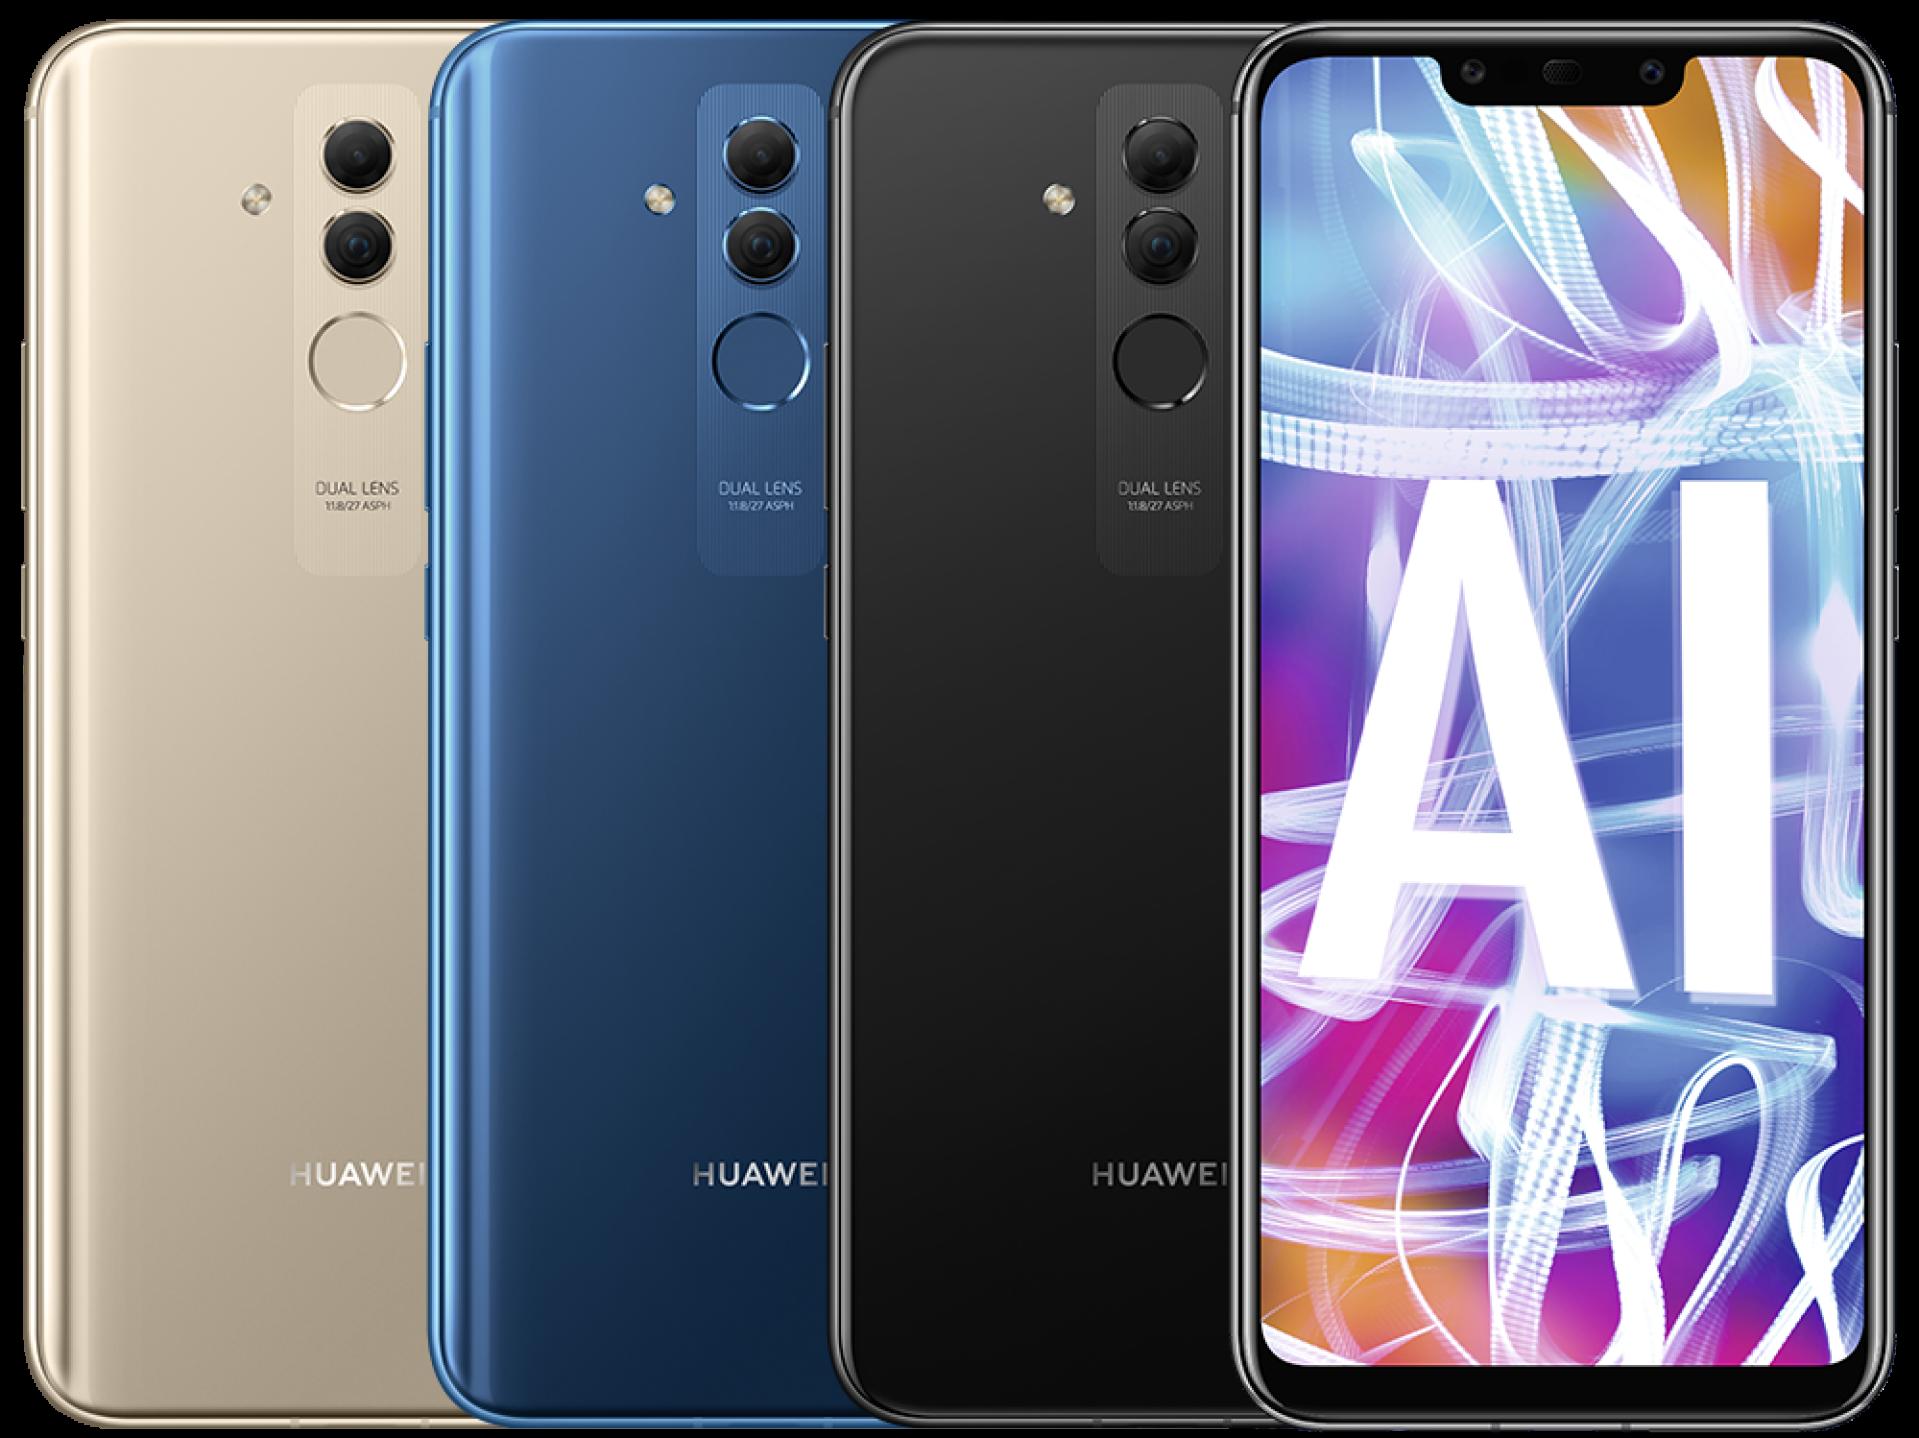 Das Huawei Mate 20 Lite